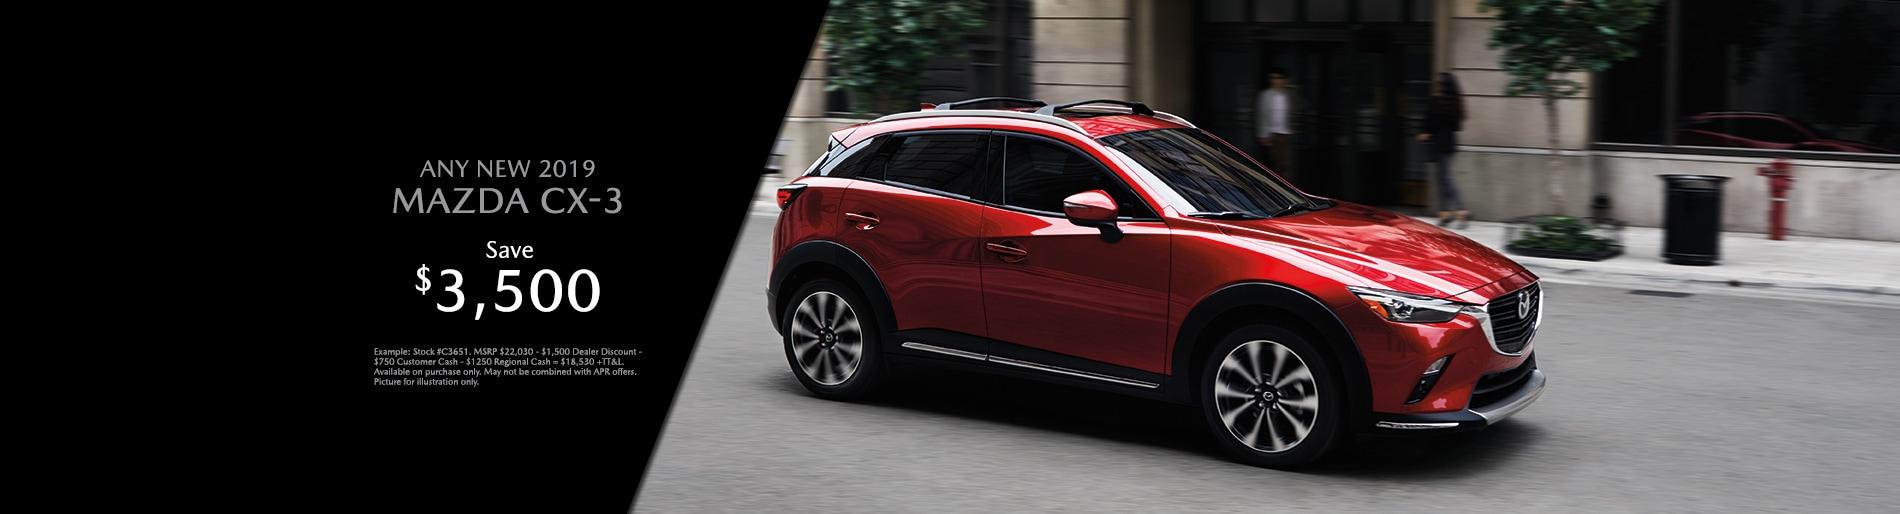 Roger Beasley Mazda Central >> Mazda Dealership serving the Austin Area   Roger Beasley Mazda South